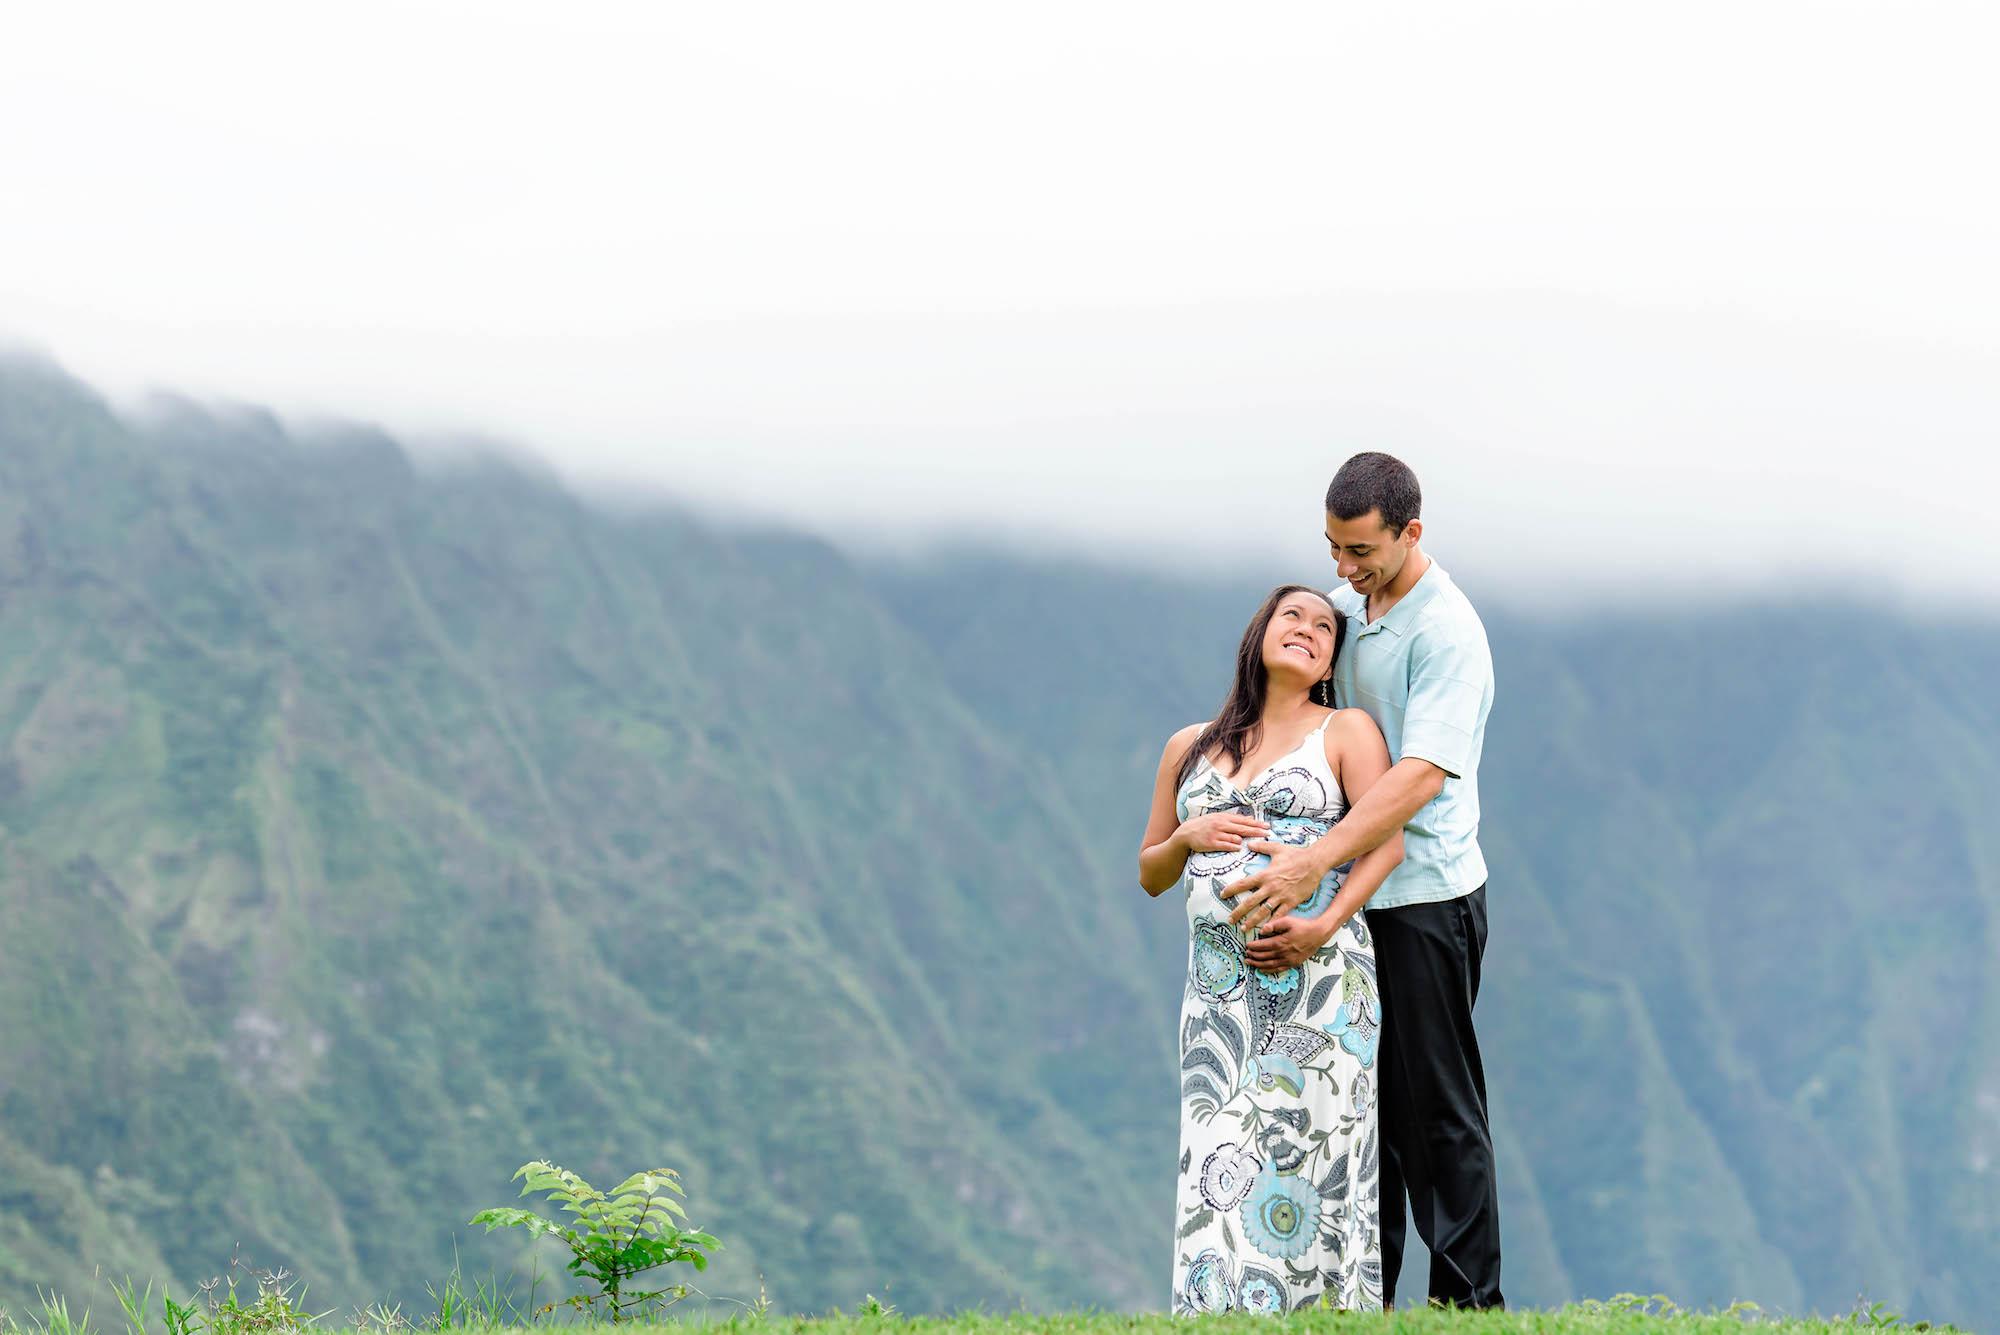 Hawaii Maternity Photos at Koolau Ballrooms - Photo by Mayberry Multimedia